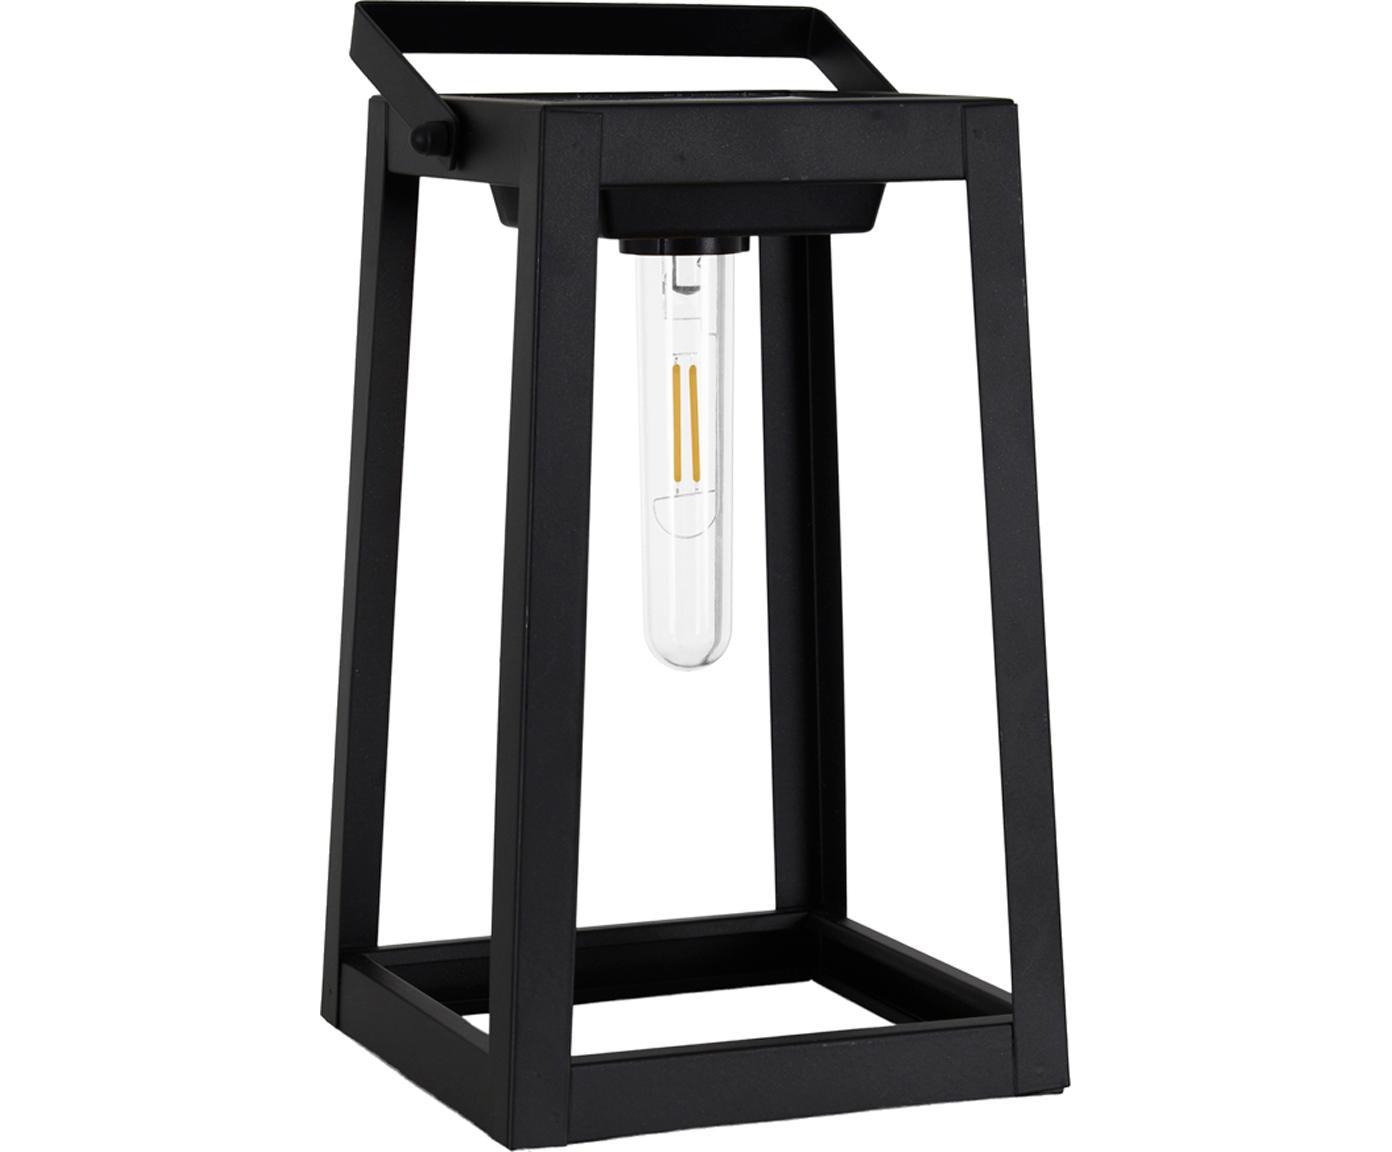 Solar LED lamp Tippy, Metaal, kunststof, Zwart, L 15 x H 31 cm